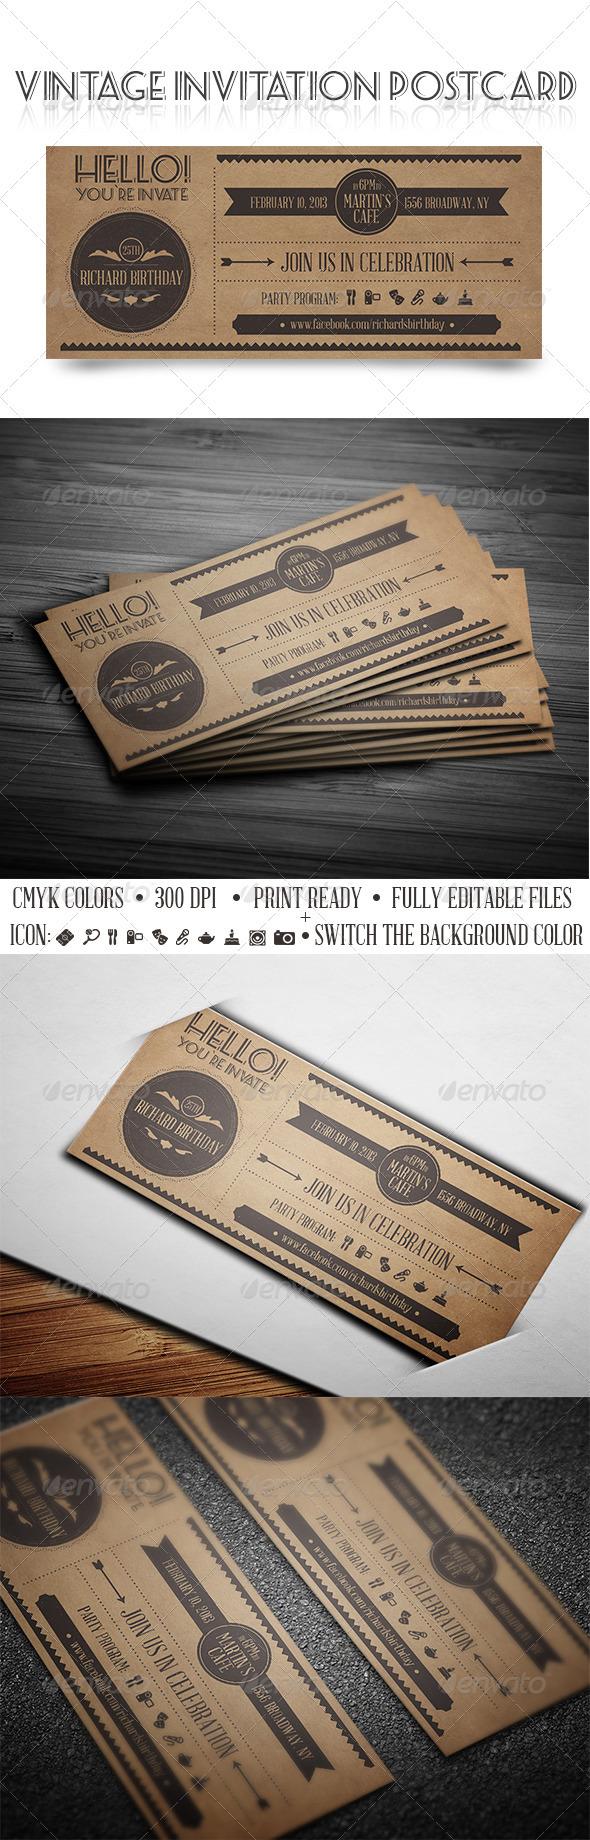 GraphicRiver Vintage Invitation Postcard 3892739